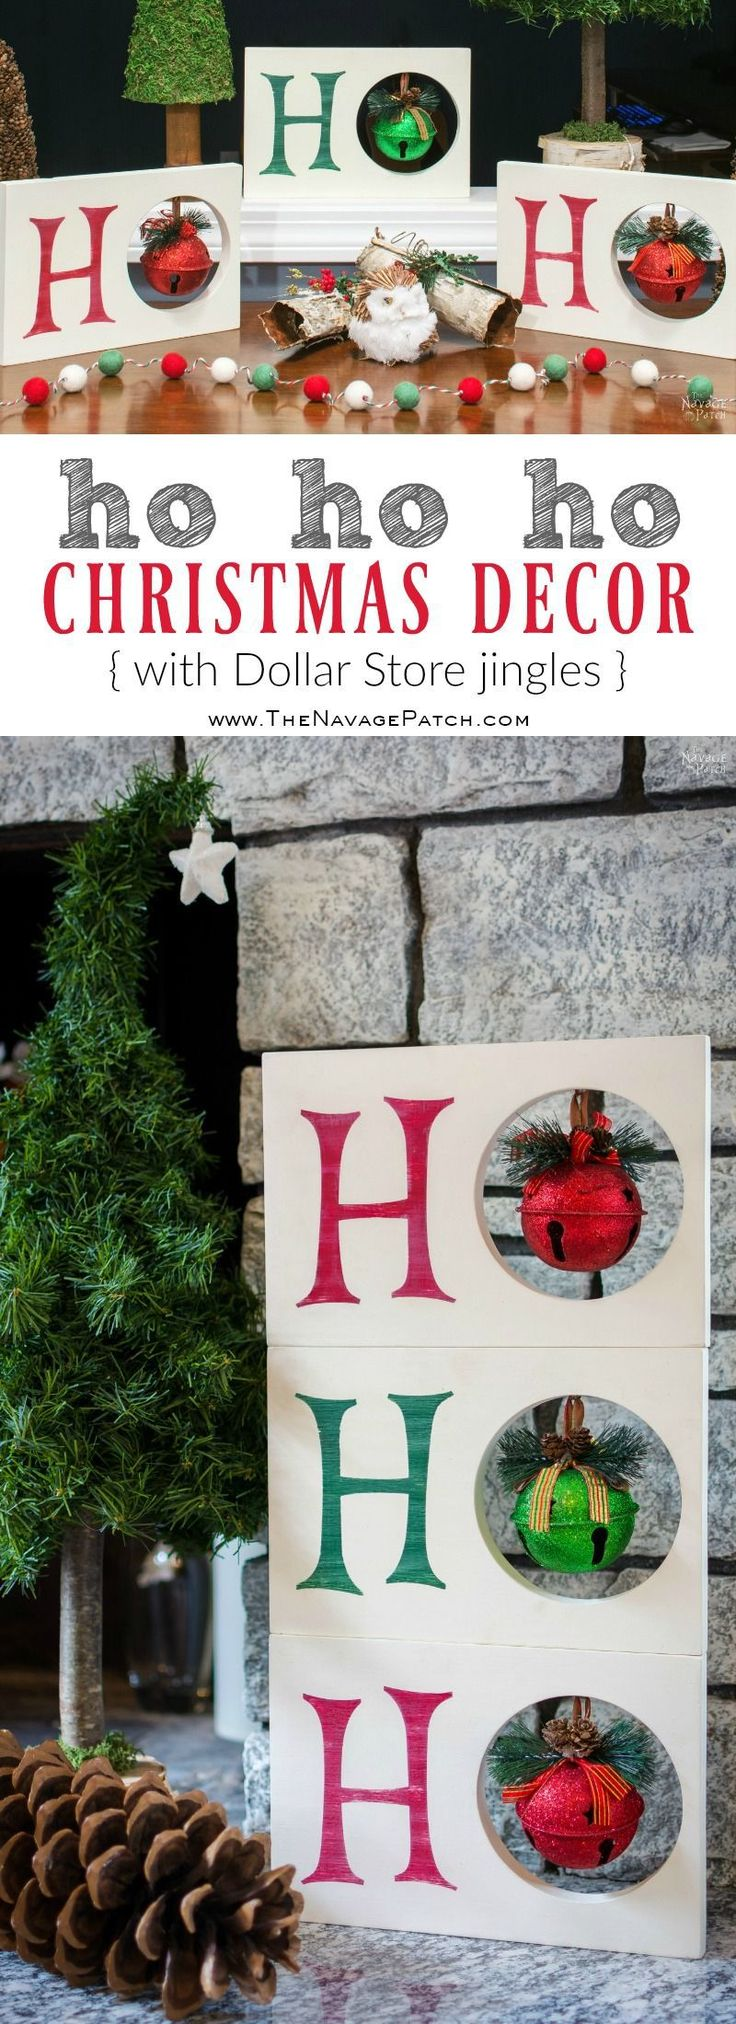 DIY HO HO HO Christmas Decor @thenavagepatch.com #christmasdecor #christmasdiy #christmascrafting